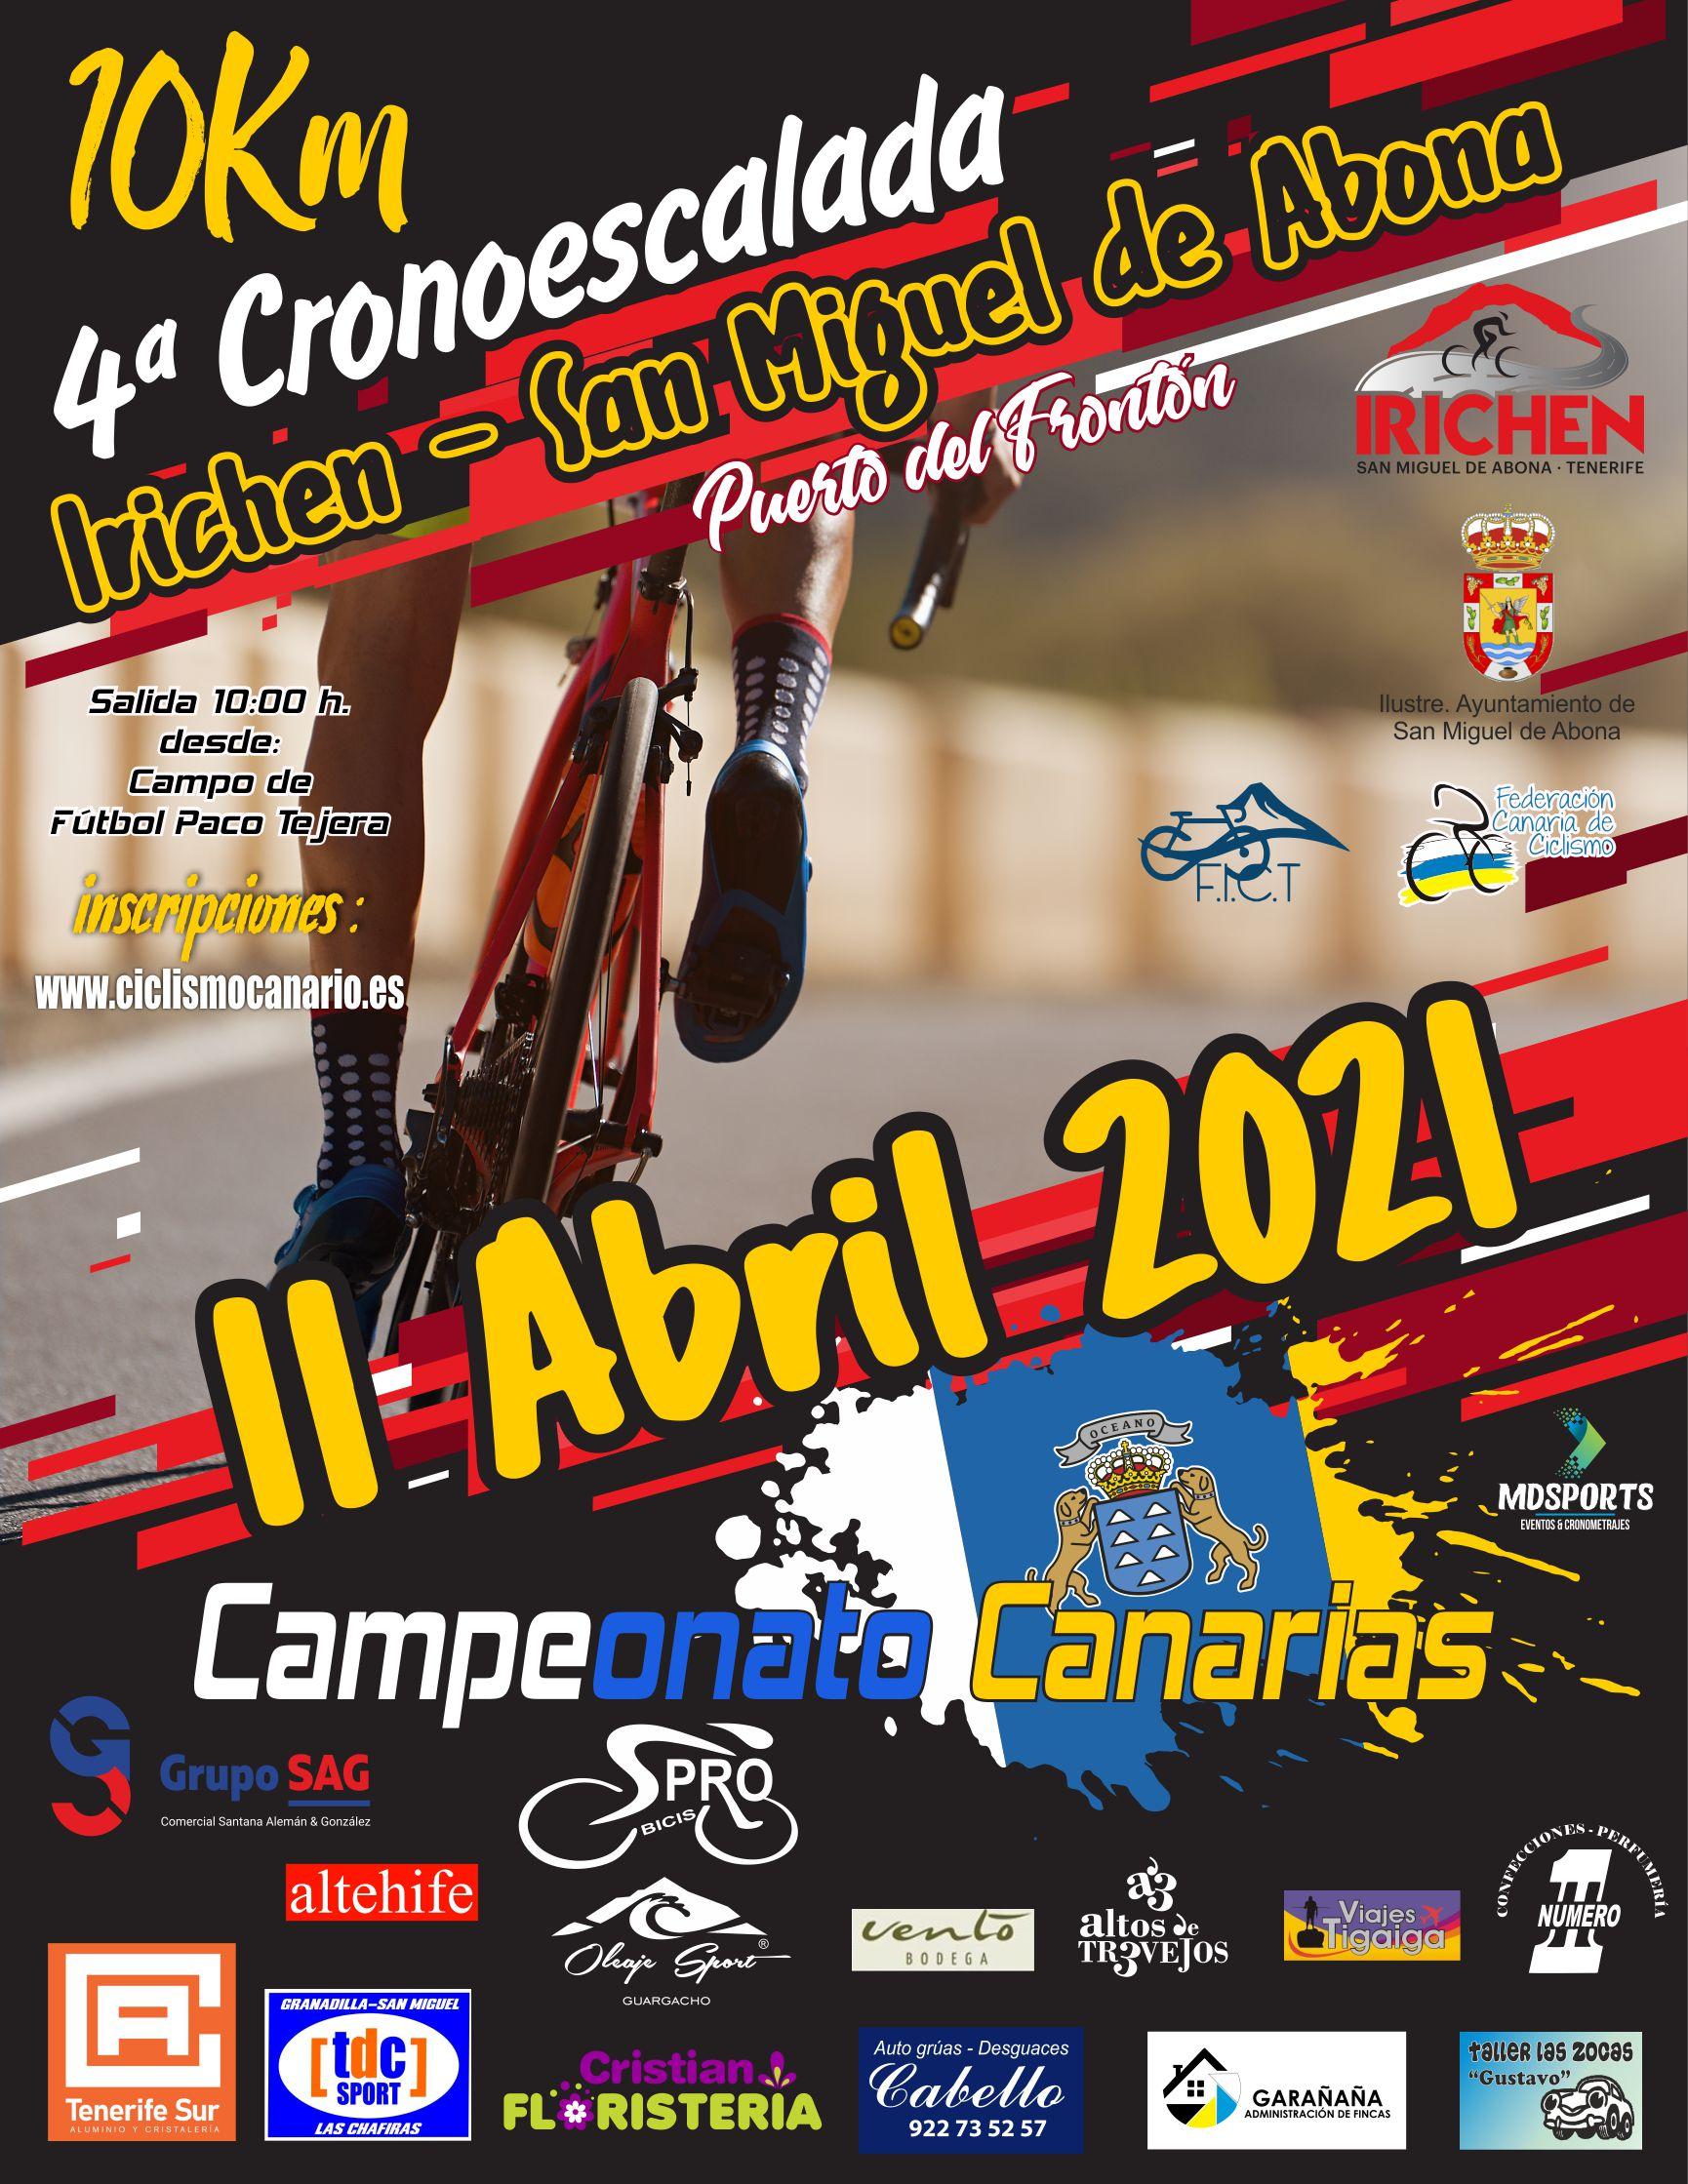 4ª Cronoescalada Irichen San Miguel 2021